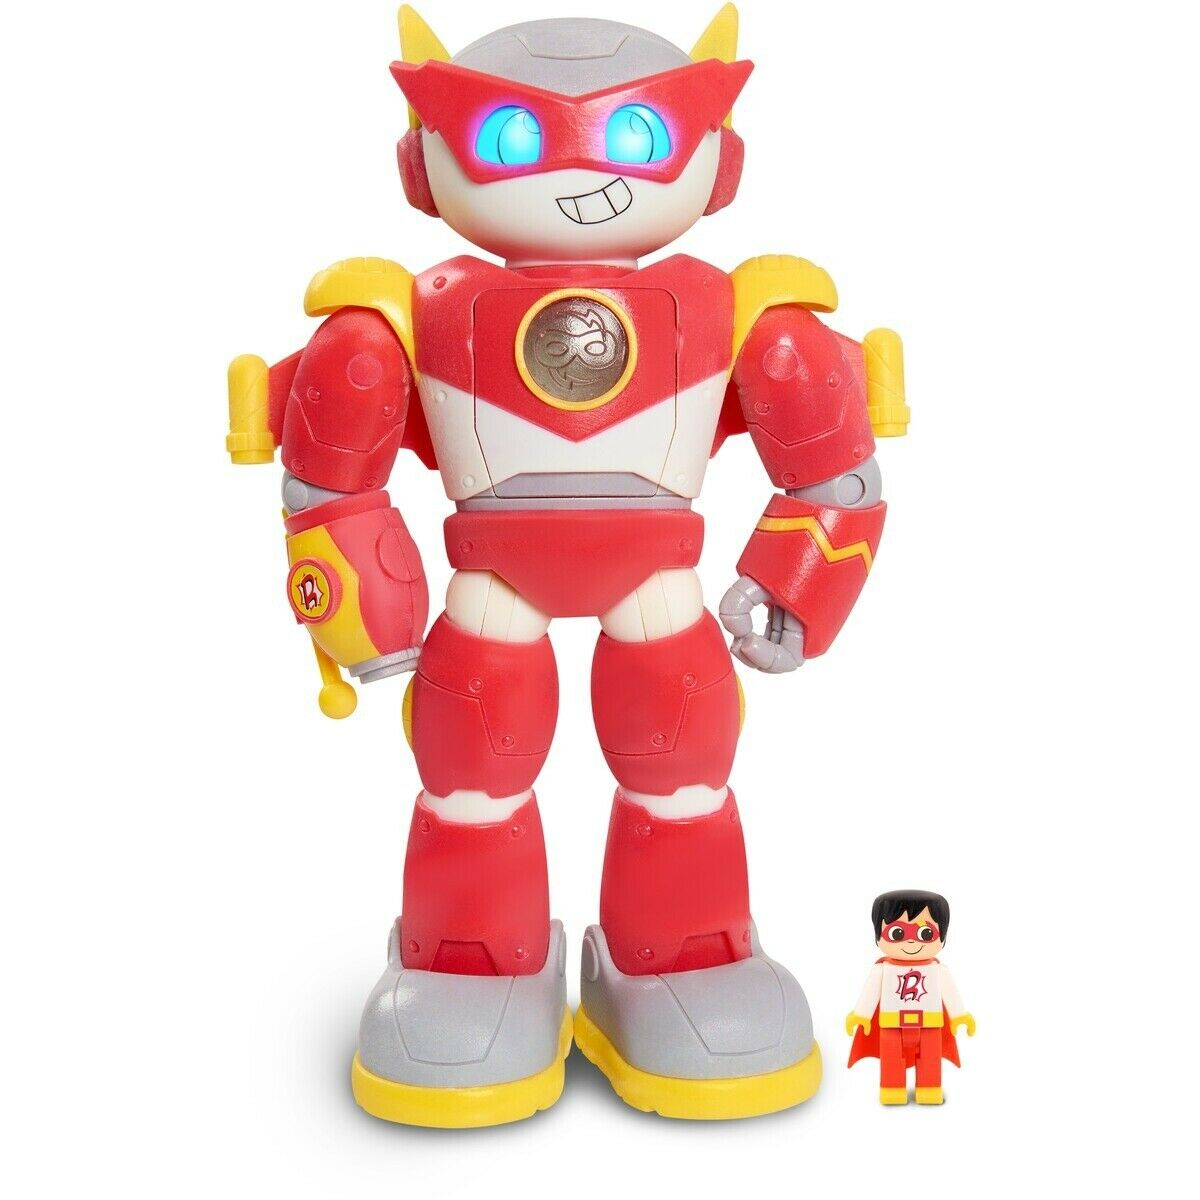 NEW Ryan's World Ultimate rot Titan Light n Sound Robot Playset Birthday Gift